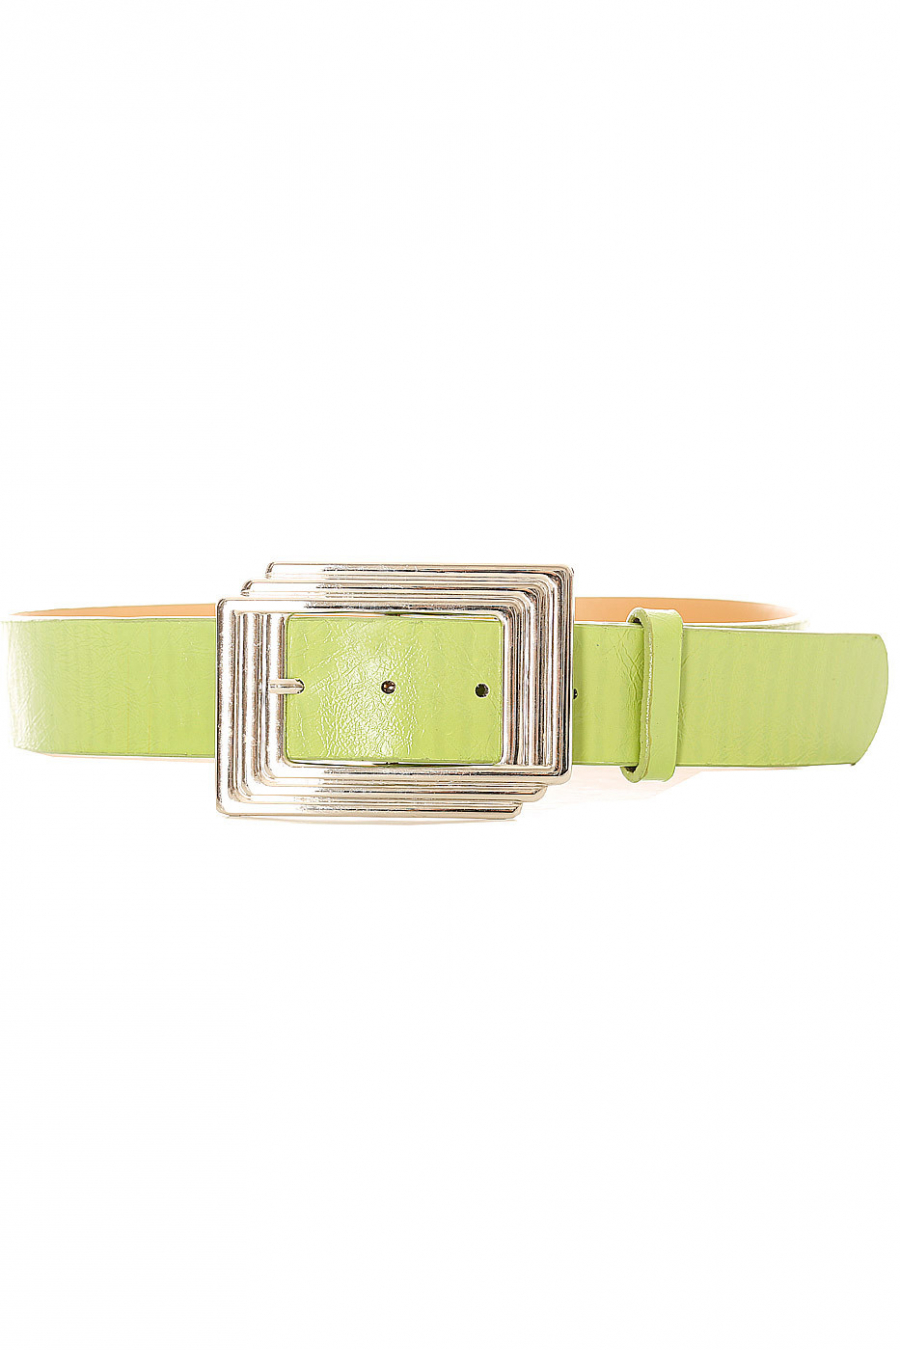 Women's belt in green with rectangular buckle. SG0218